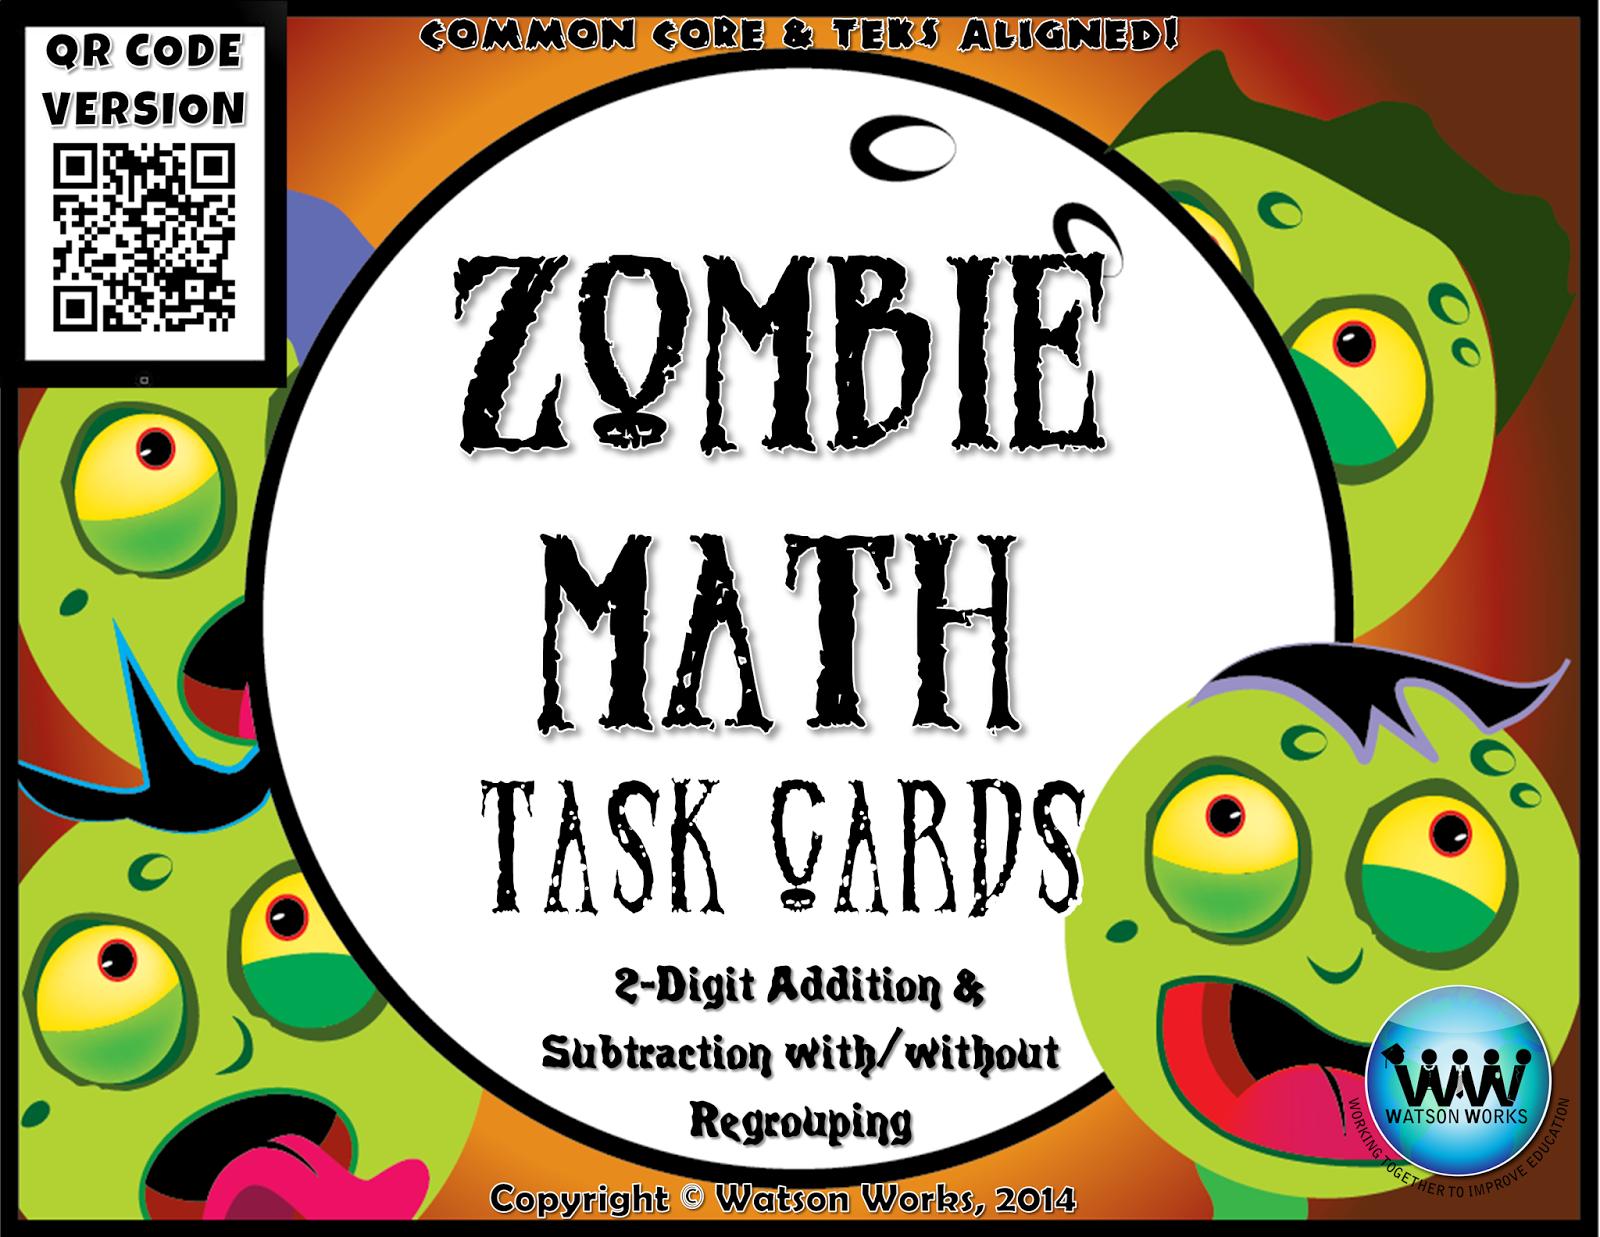 http://www.teacherspayteachers.com/Product/Zombie-Math-Task-CardsQR-Code-Version-2-Digit-Addition-Subtraction-1519511